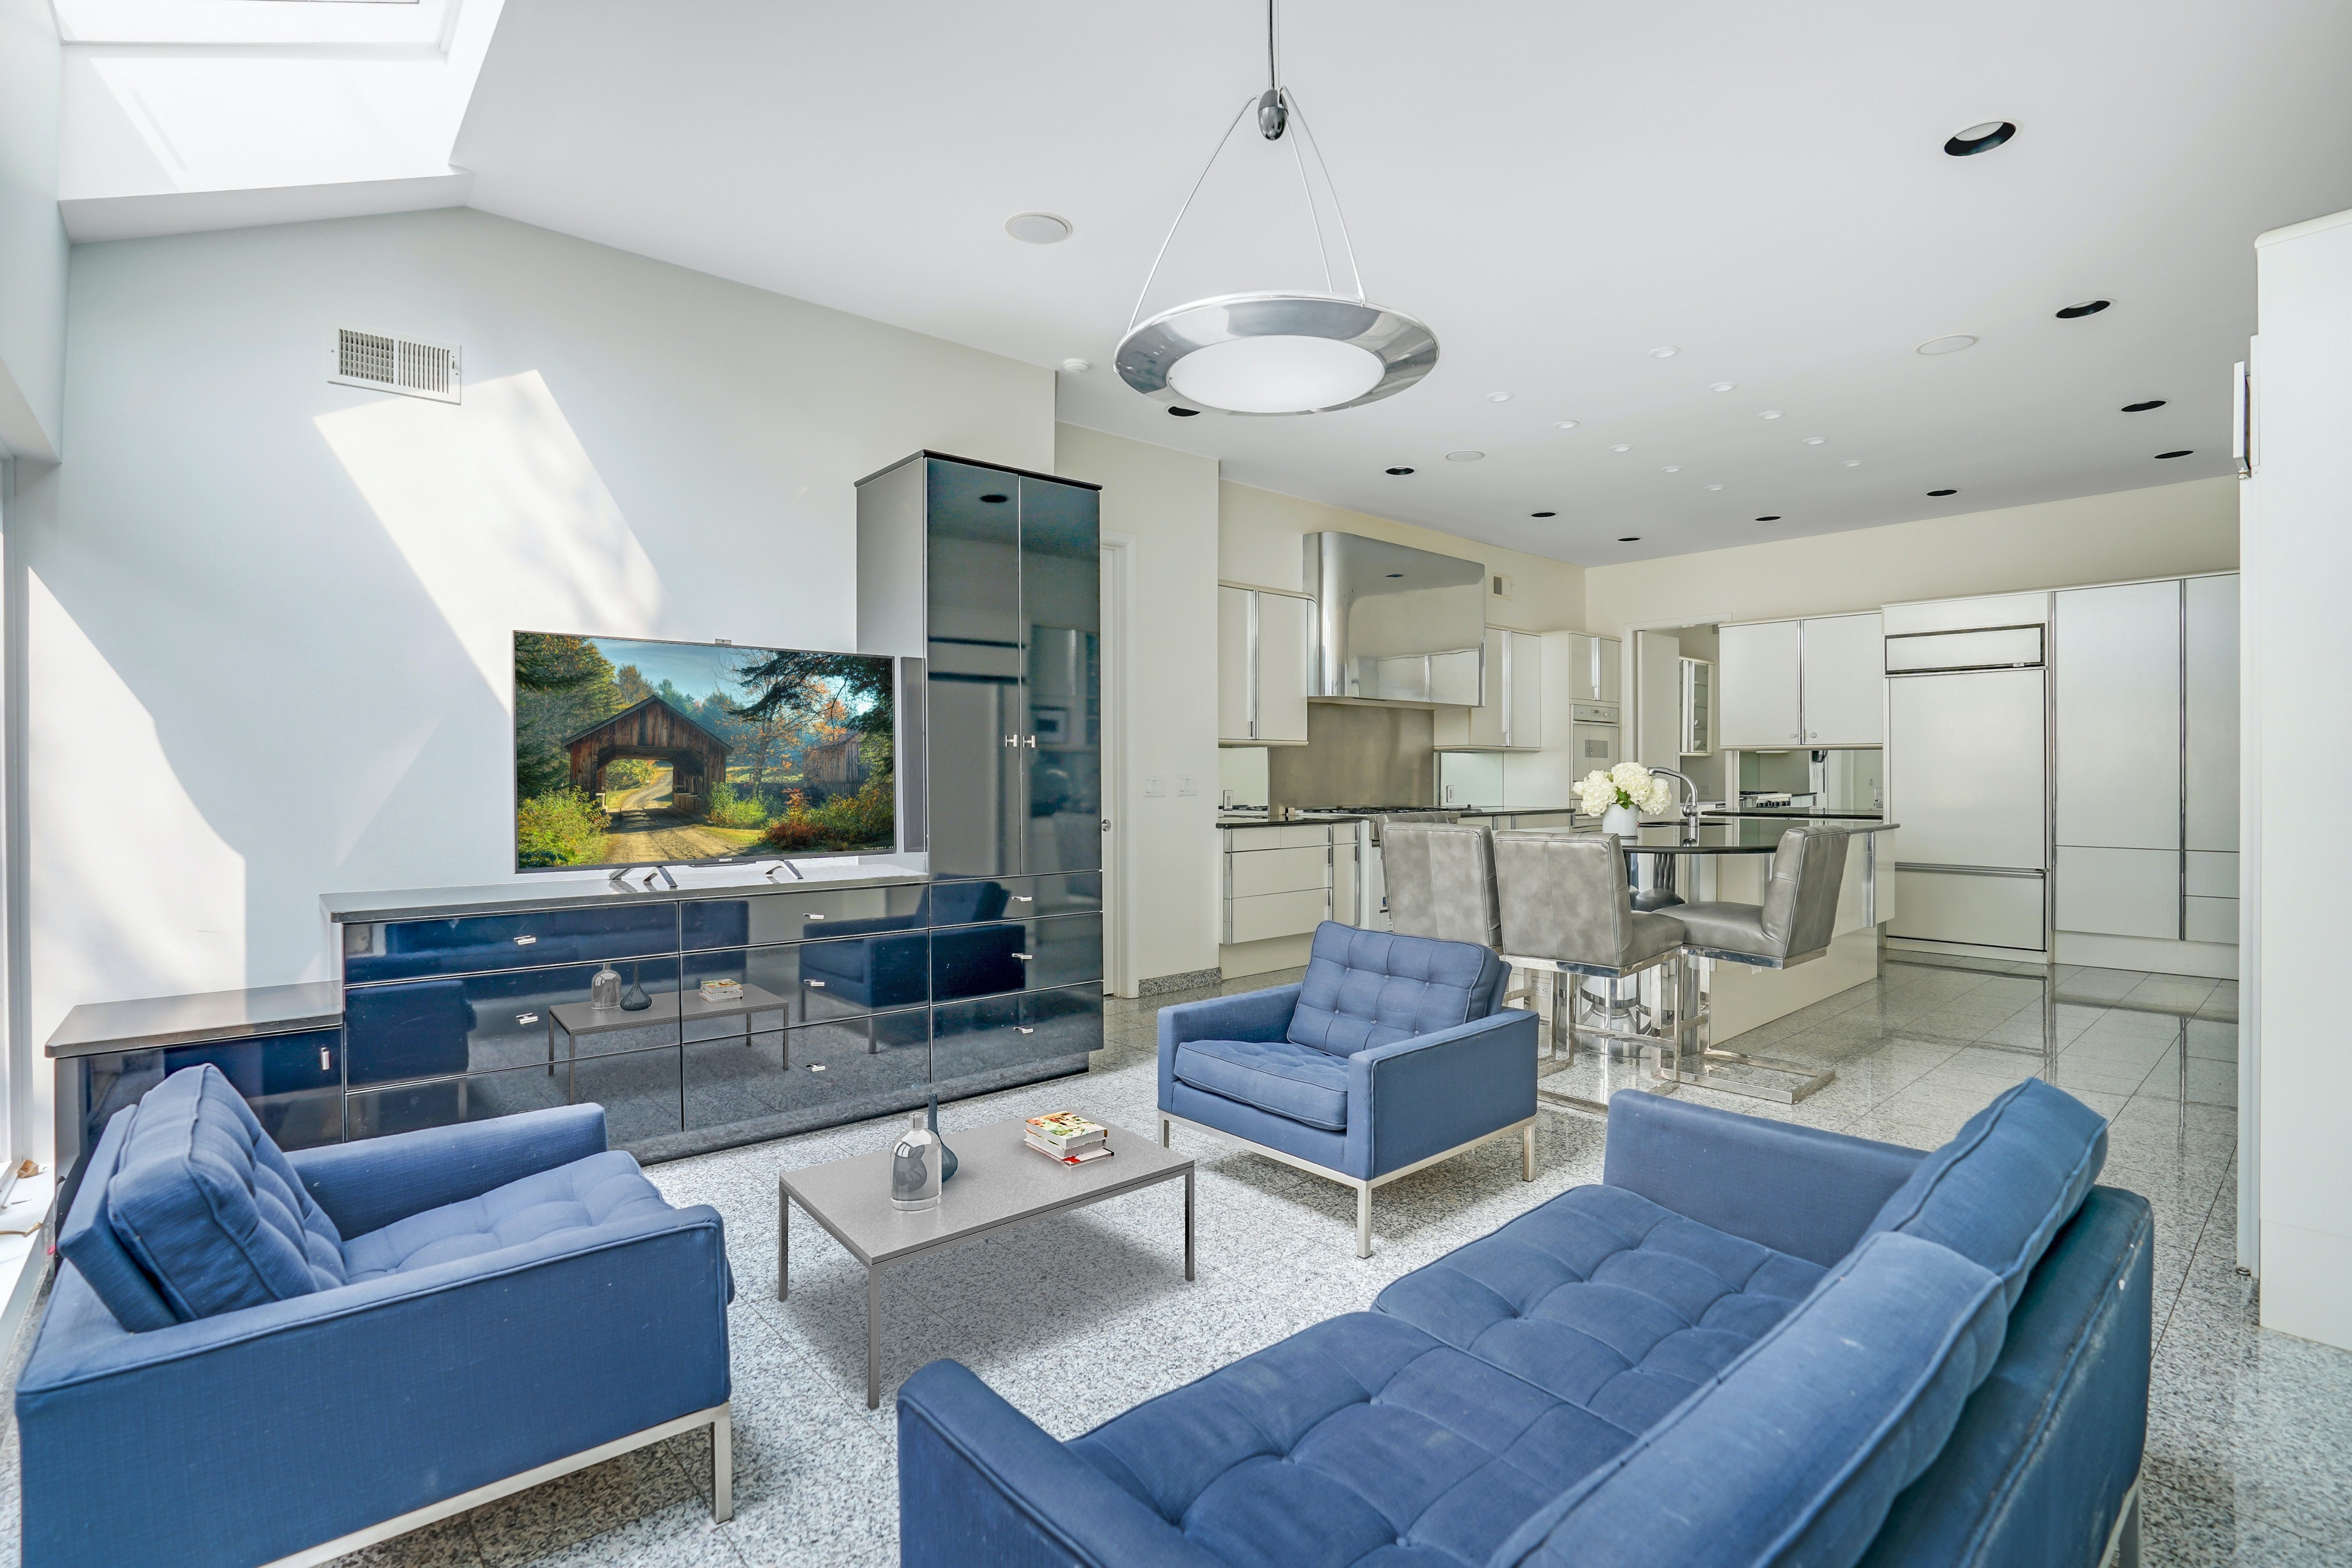 261 Hartshorn Drive Kitchen/Family Room